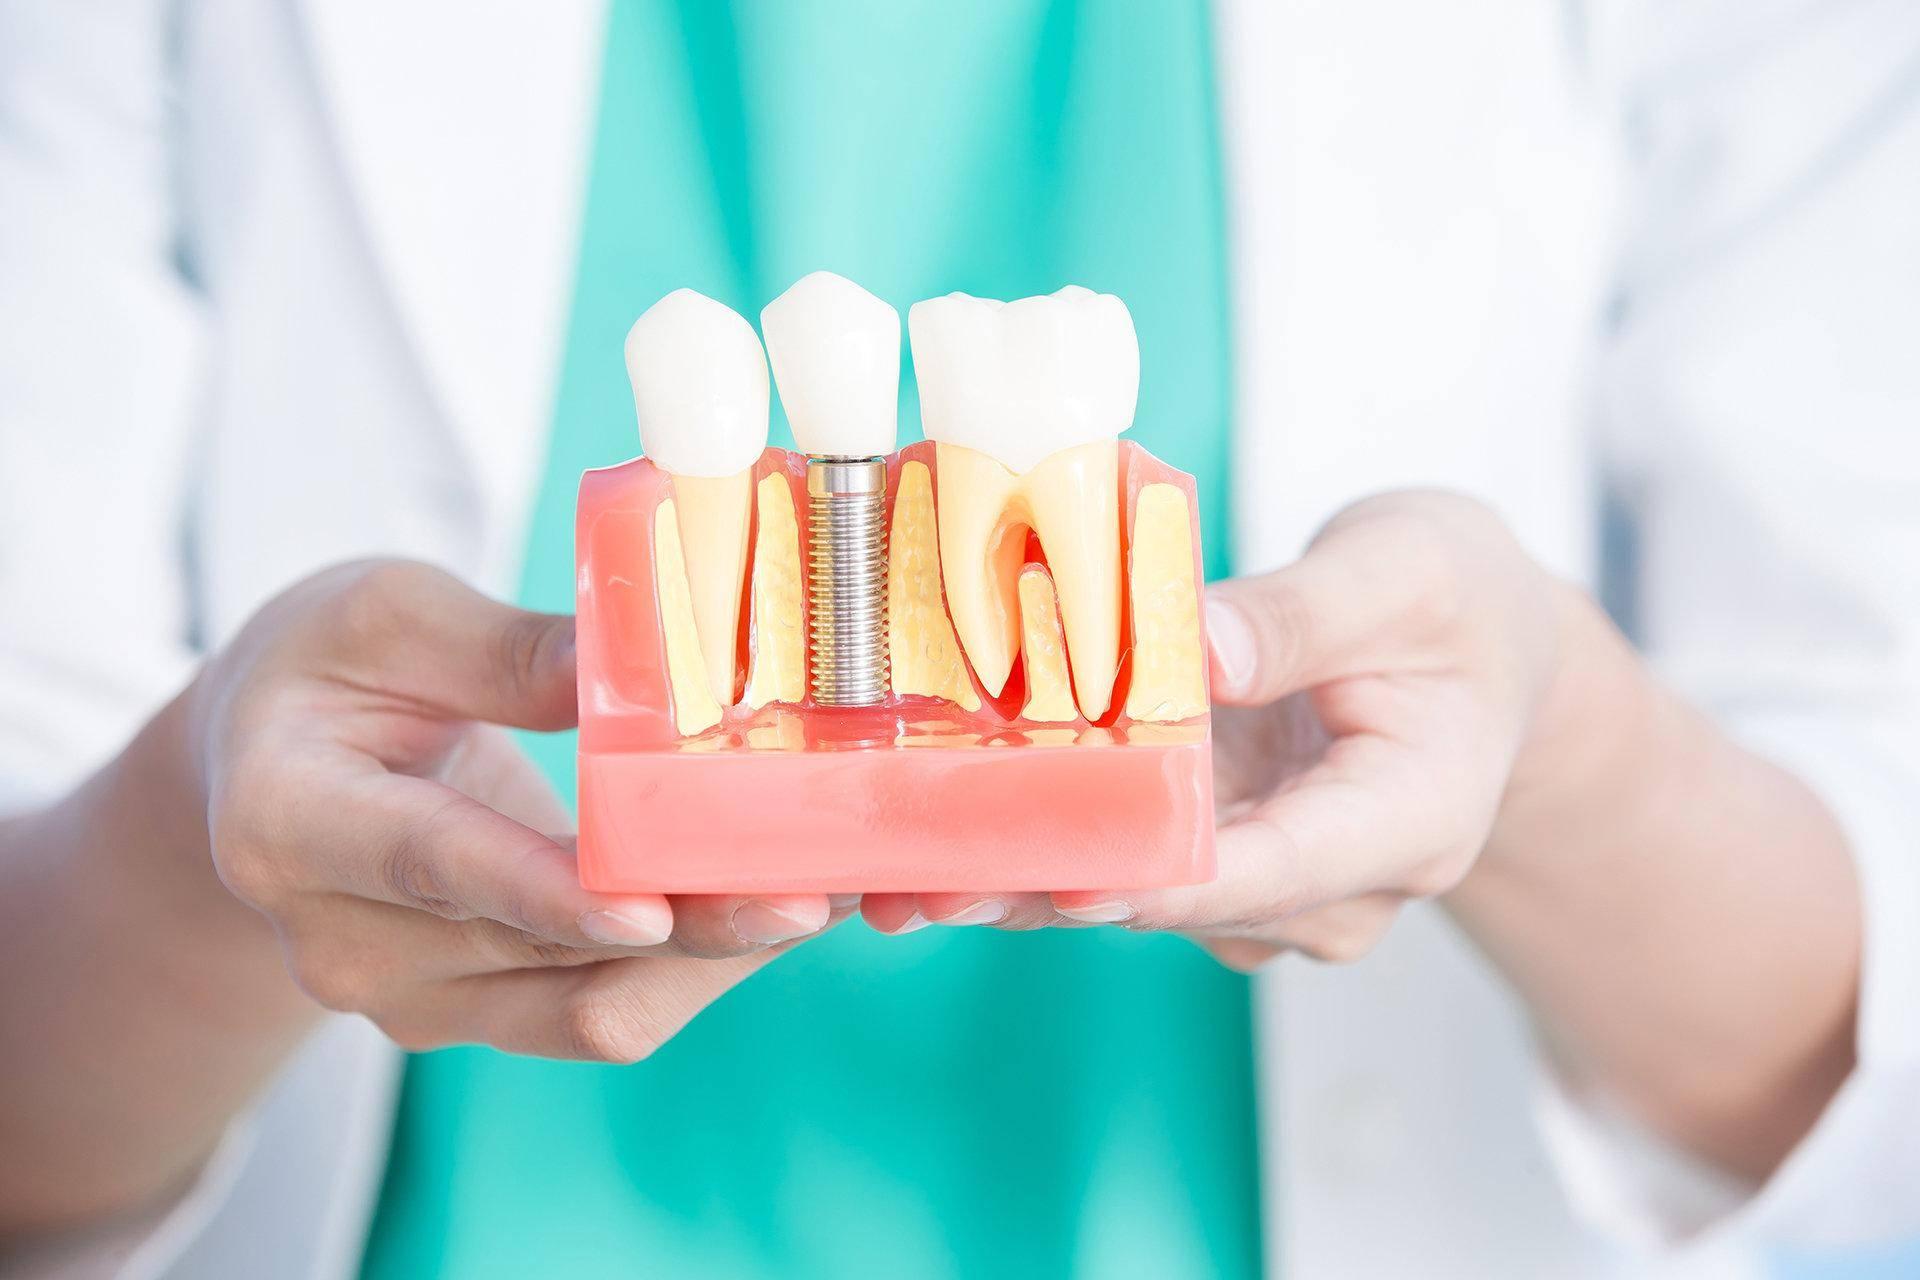 Имплантация зубов при сахарном диабете 2 типа